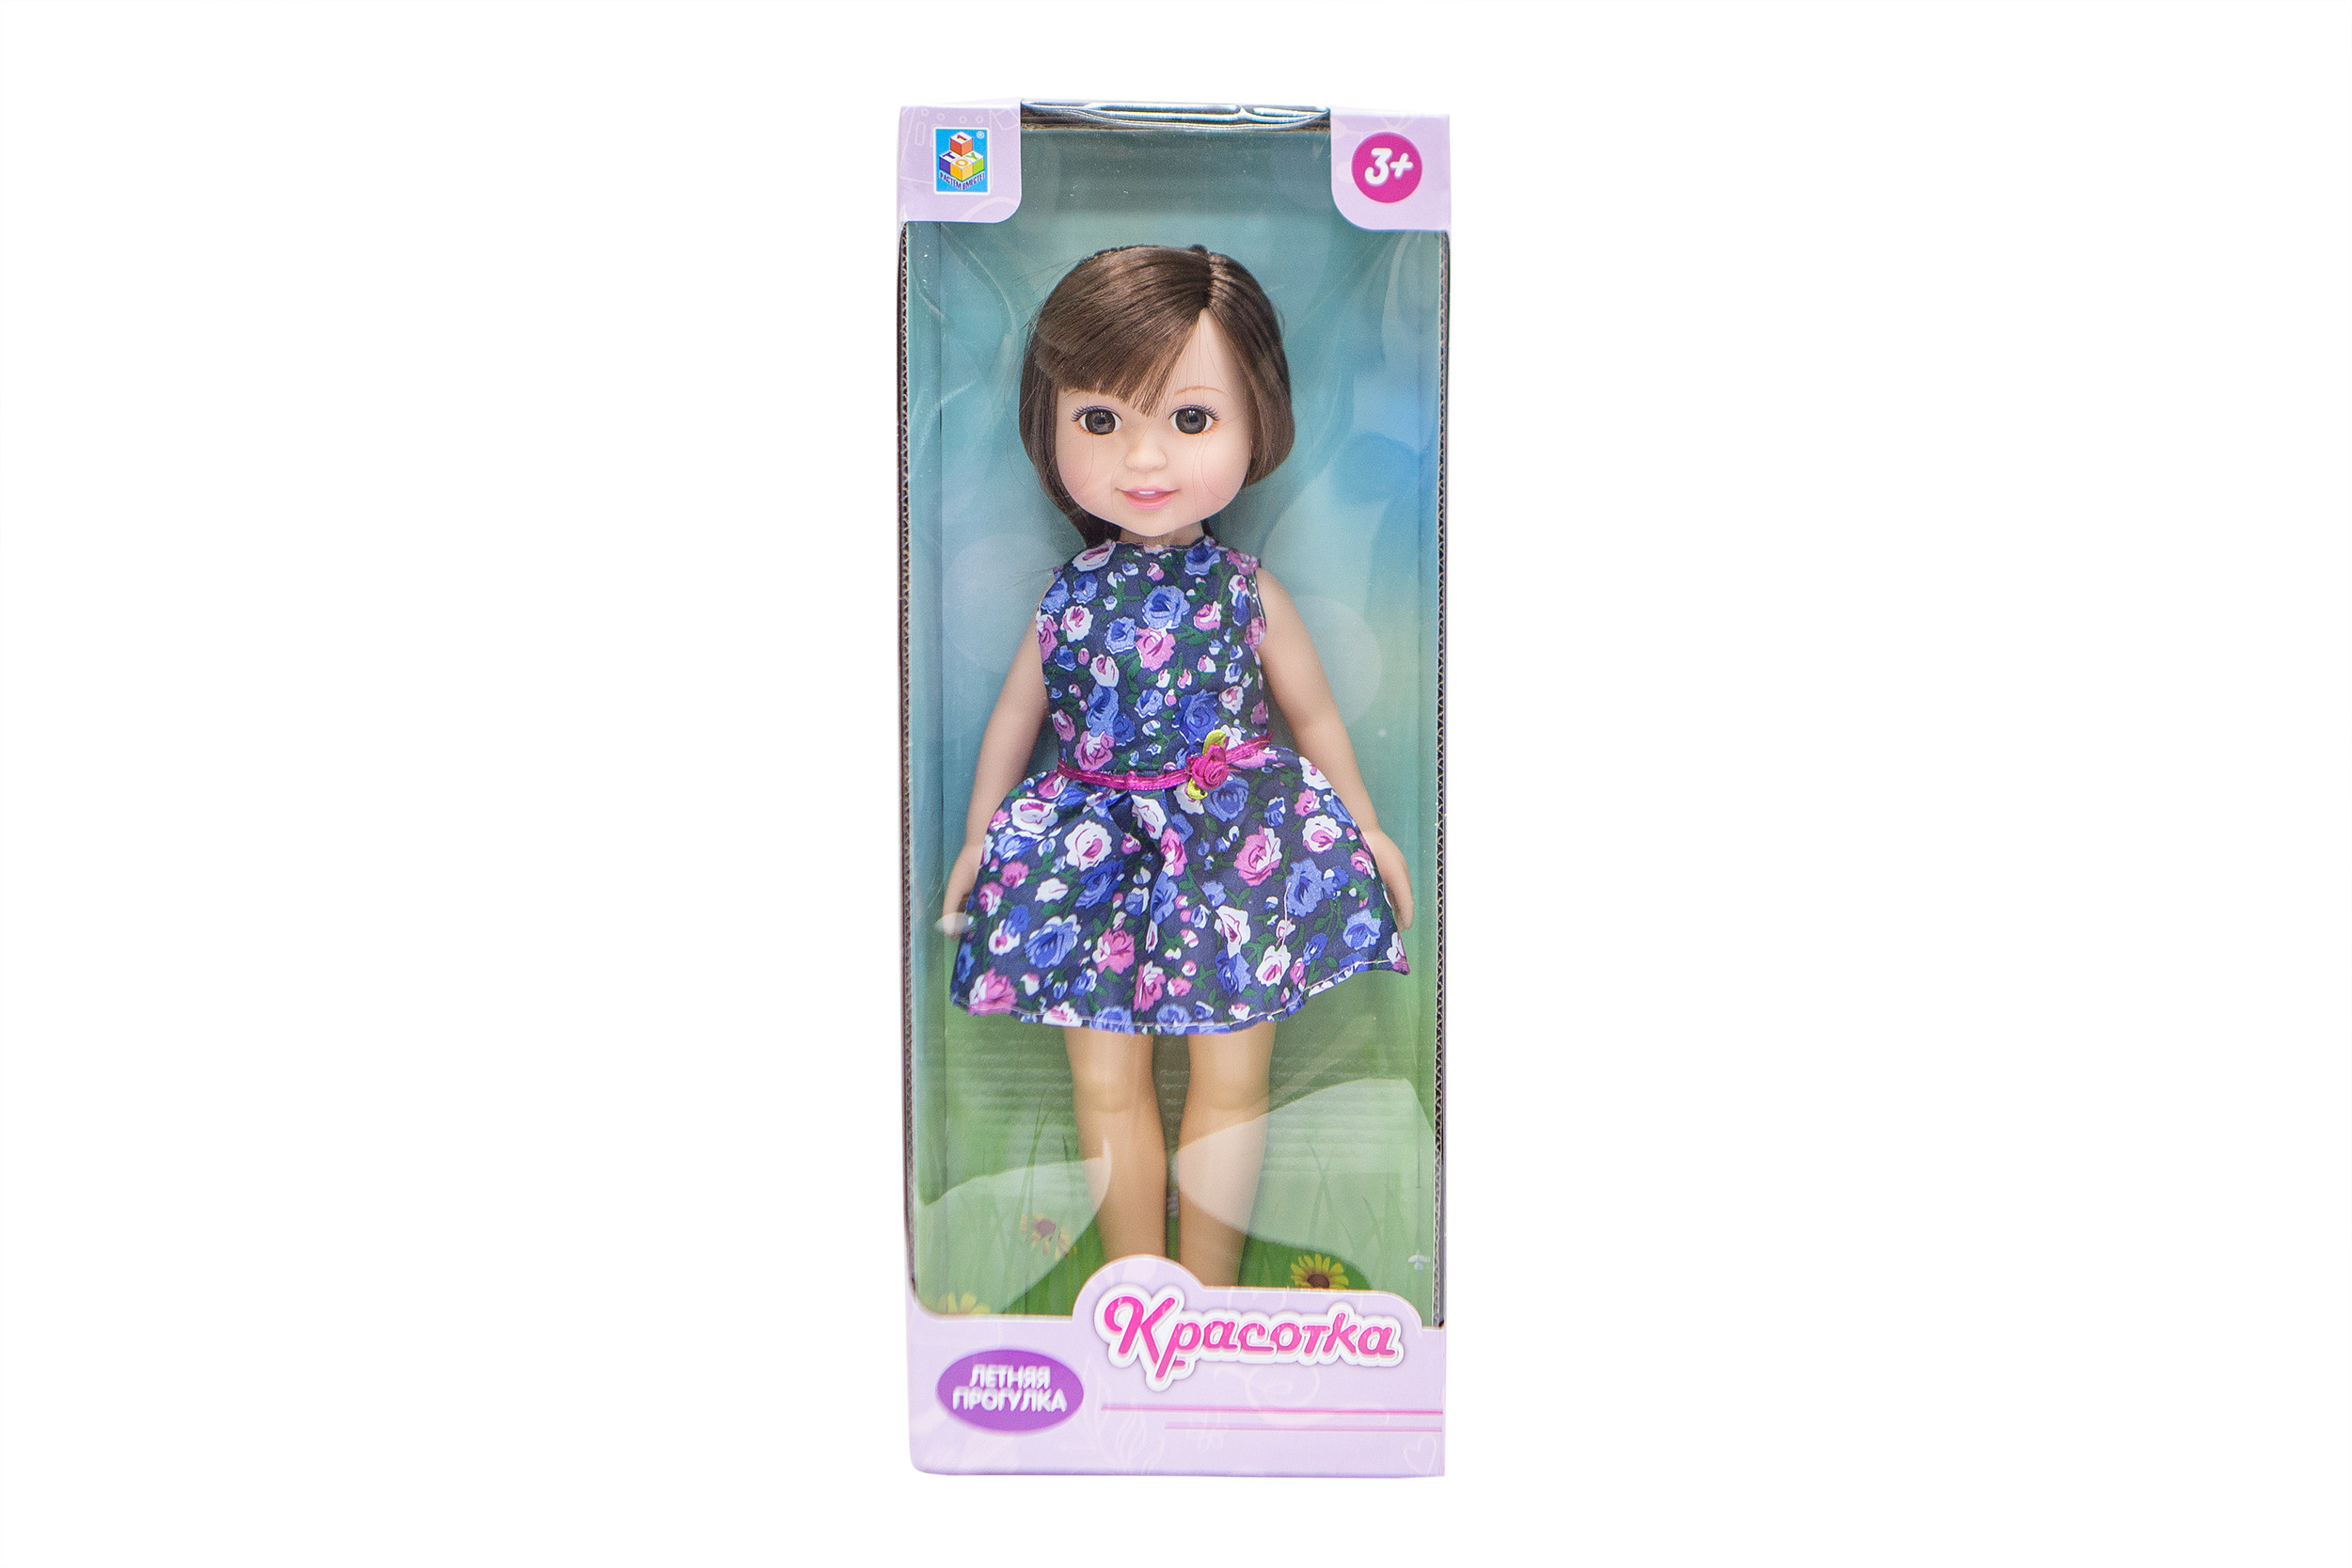 Классические куклы 1toy Кукла 1Toy «Красотка. Летняя прогулка» брюнетка, синее платье fox платье темно синее